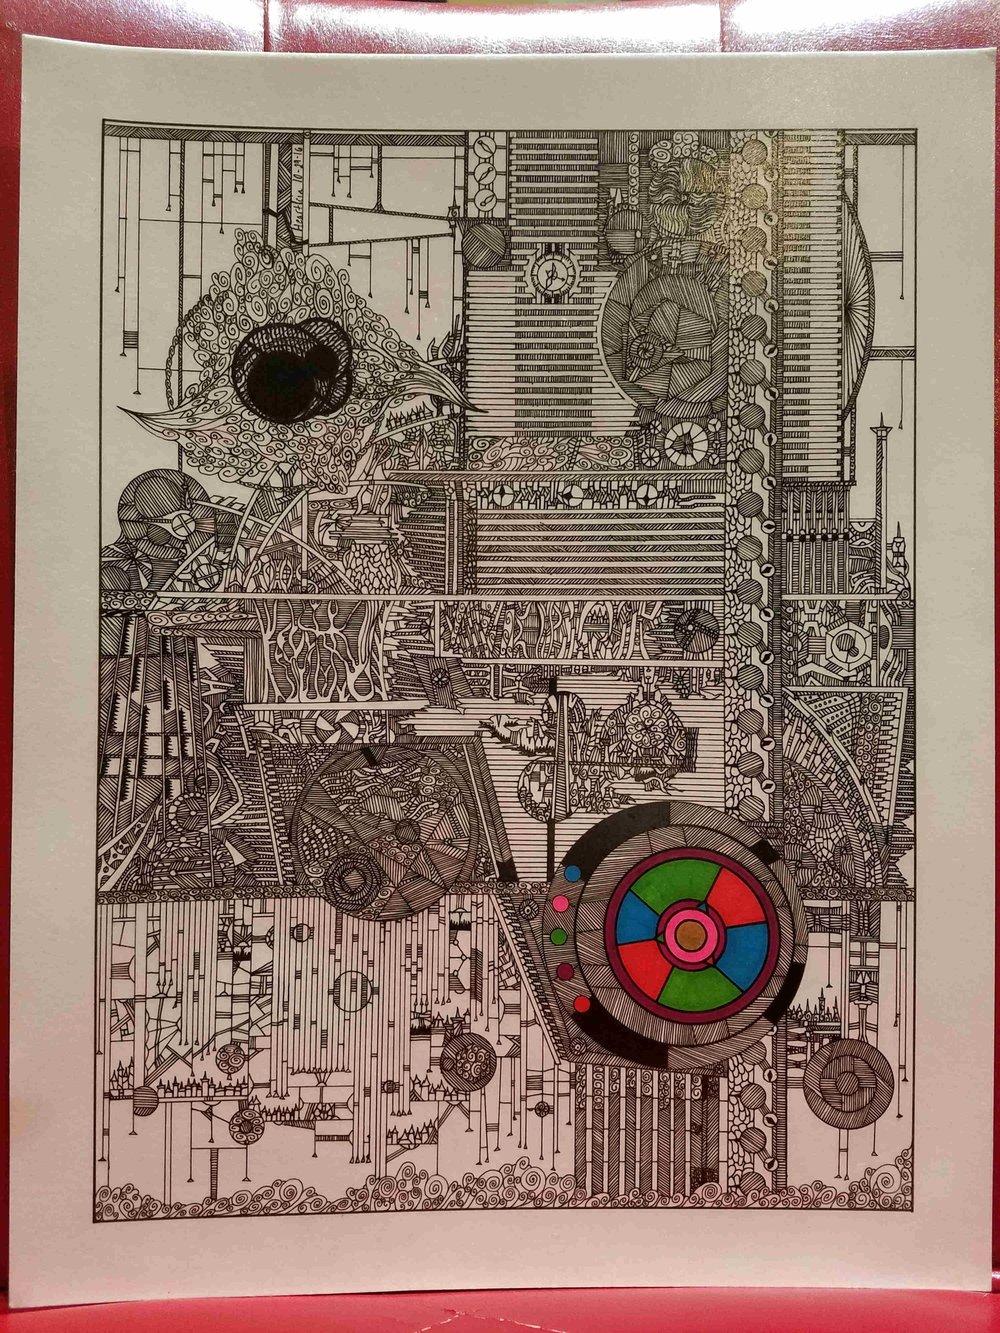 TOM HEARTLEIN  - Galesburg, IL   Clockwork Complex   pen and marker on Bristol